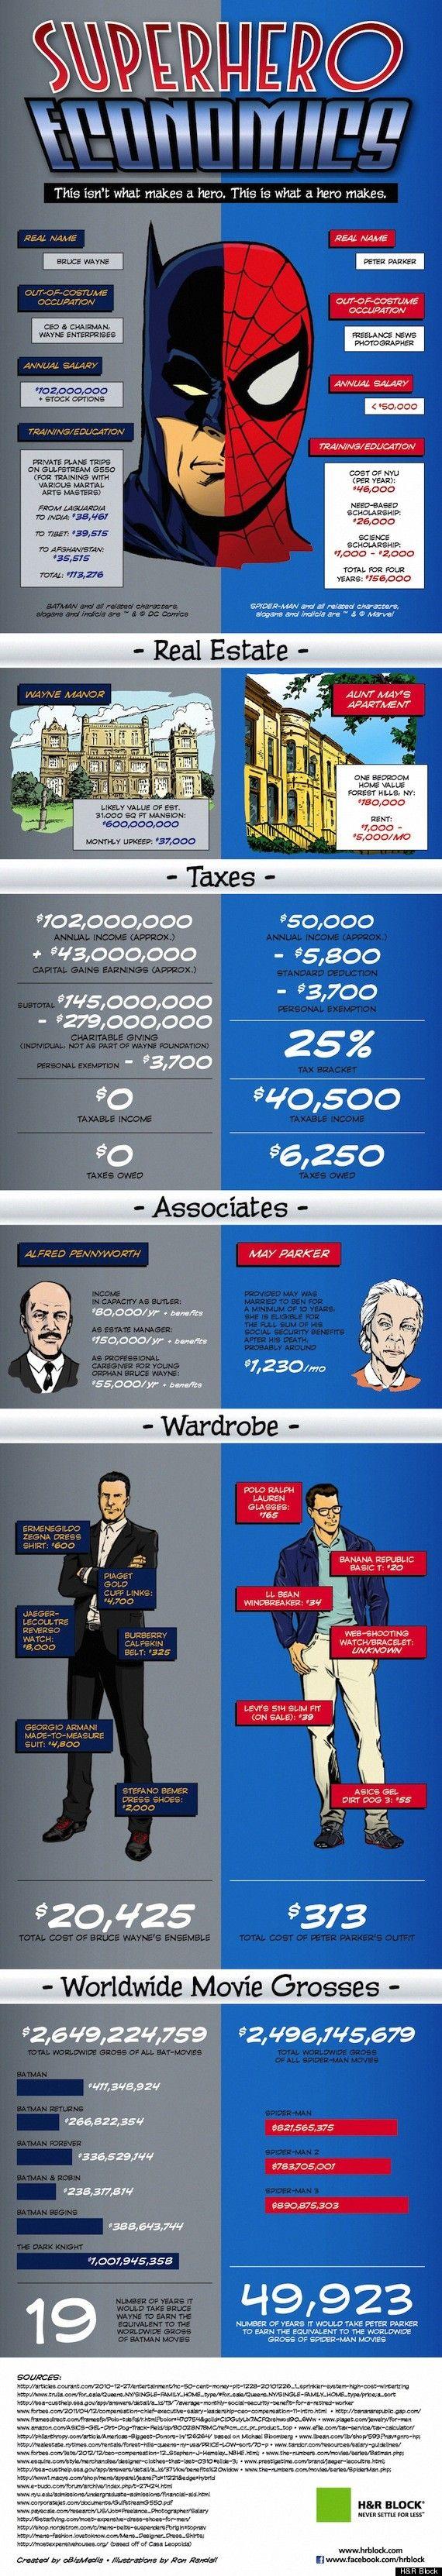 Spider-Man vs. Batman: Peter Parker & Bruce Wayne Go Head-To-Head In Superhero Economics (INFOGRAPHIC)